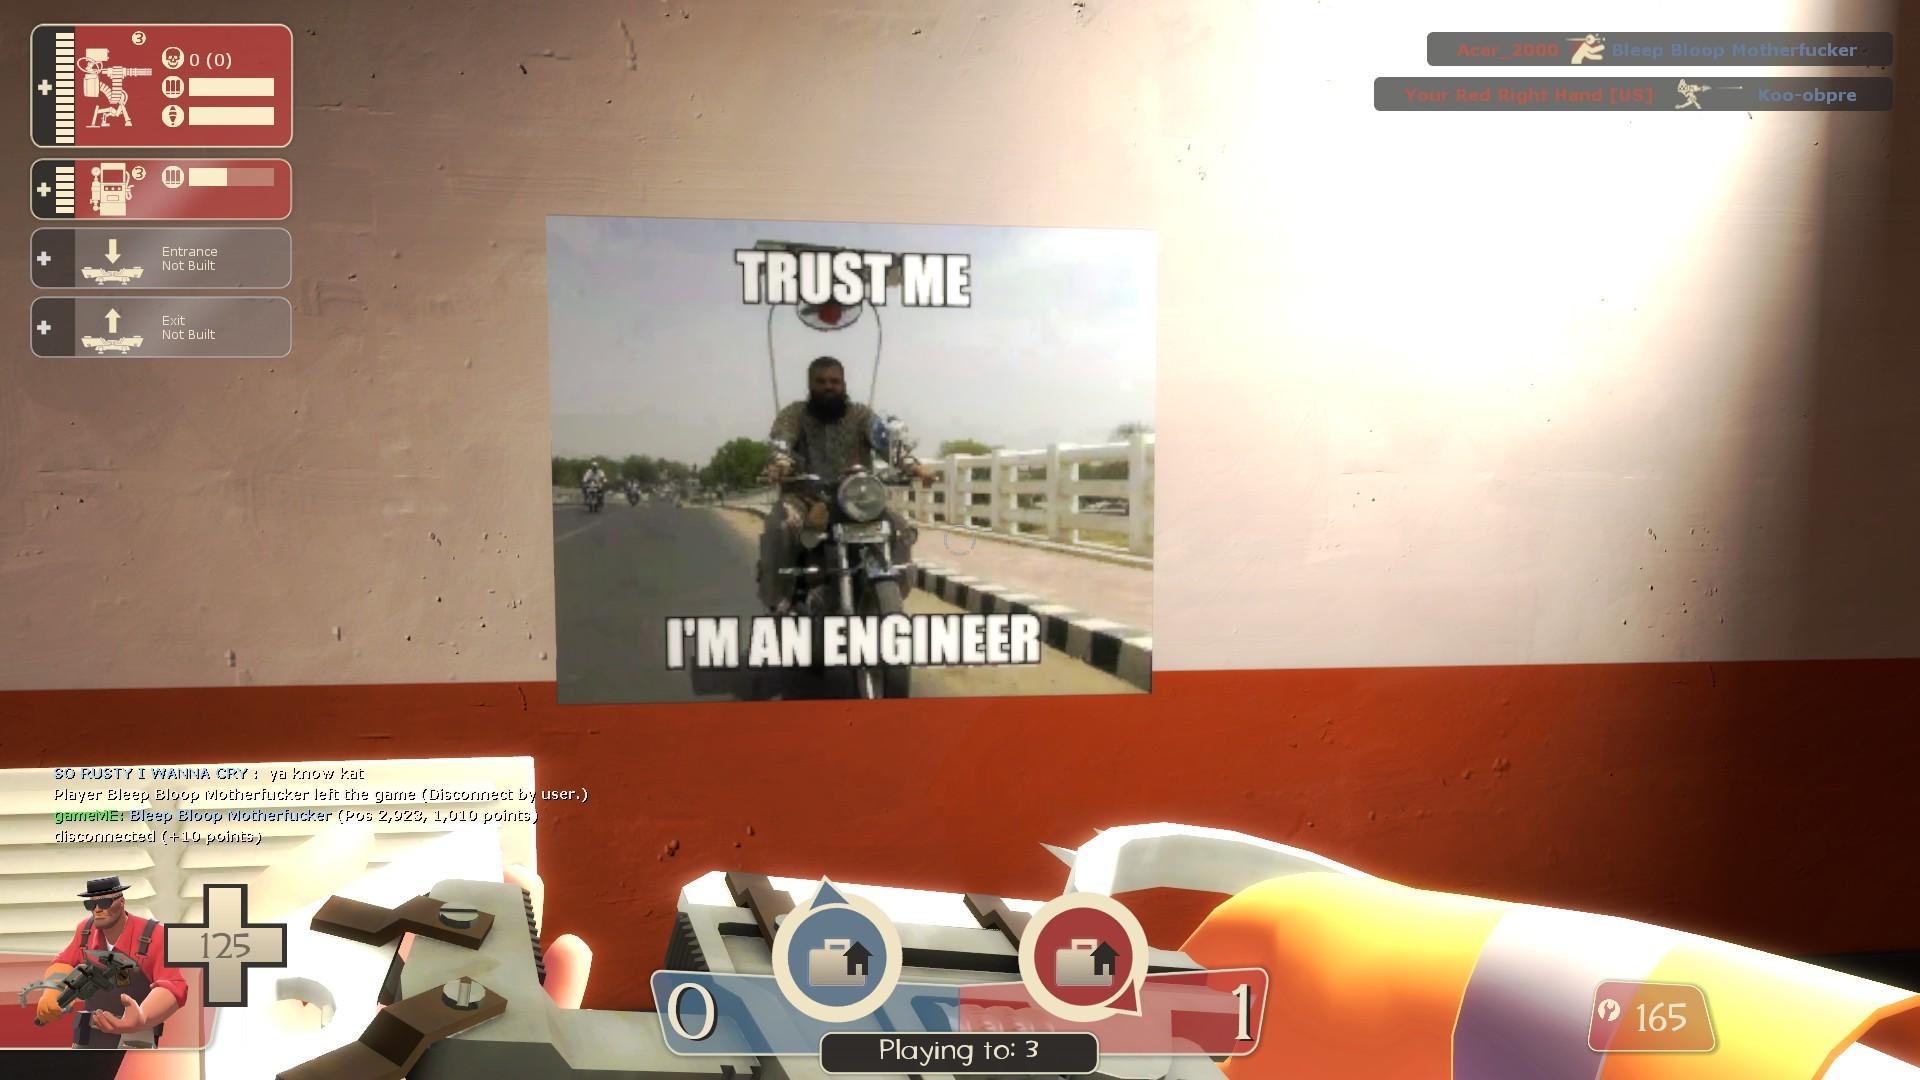 trust me im am engineer d team fortress 2 sprays